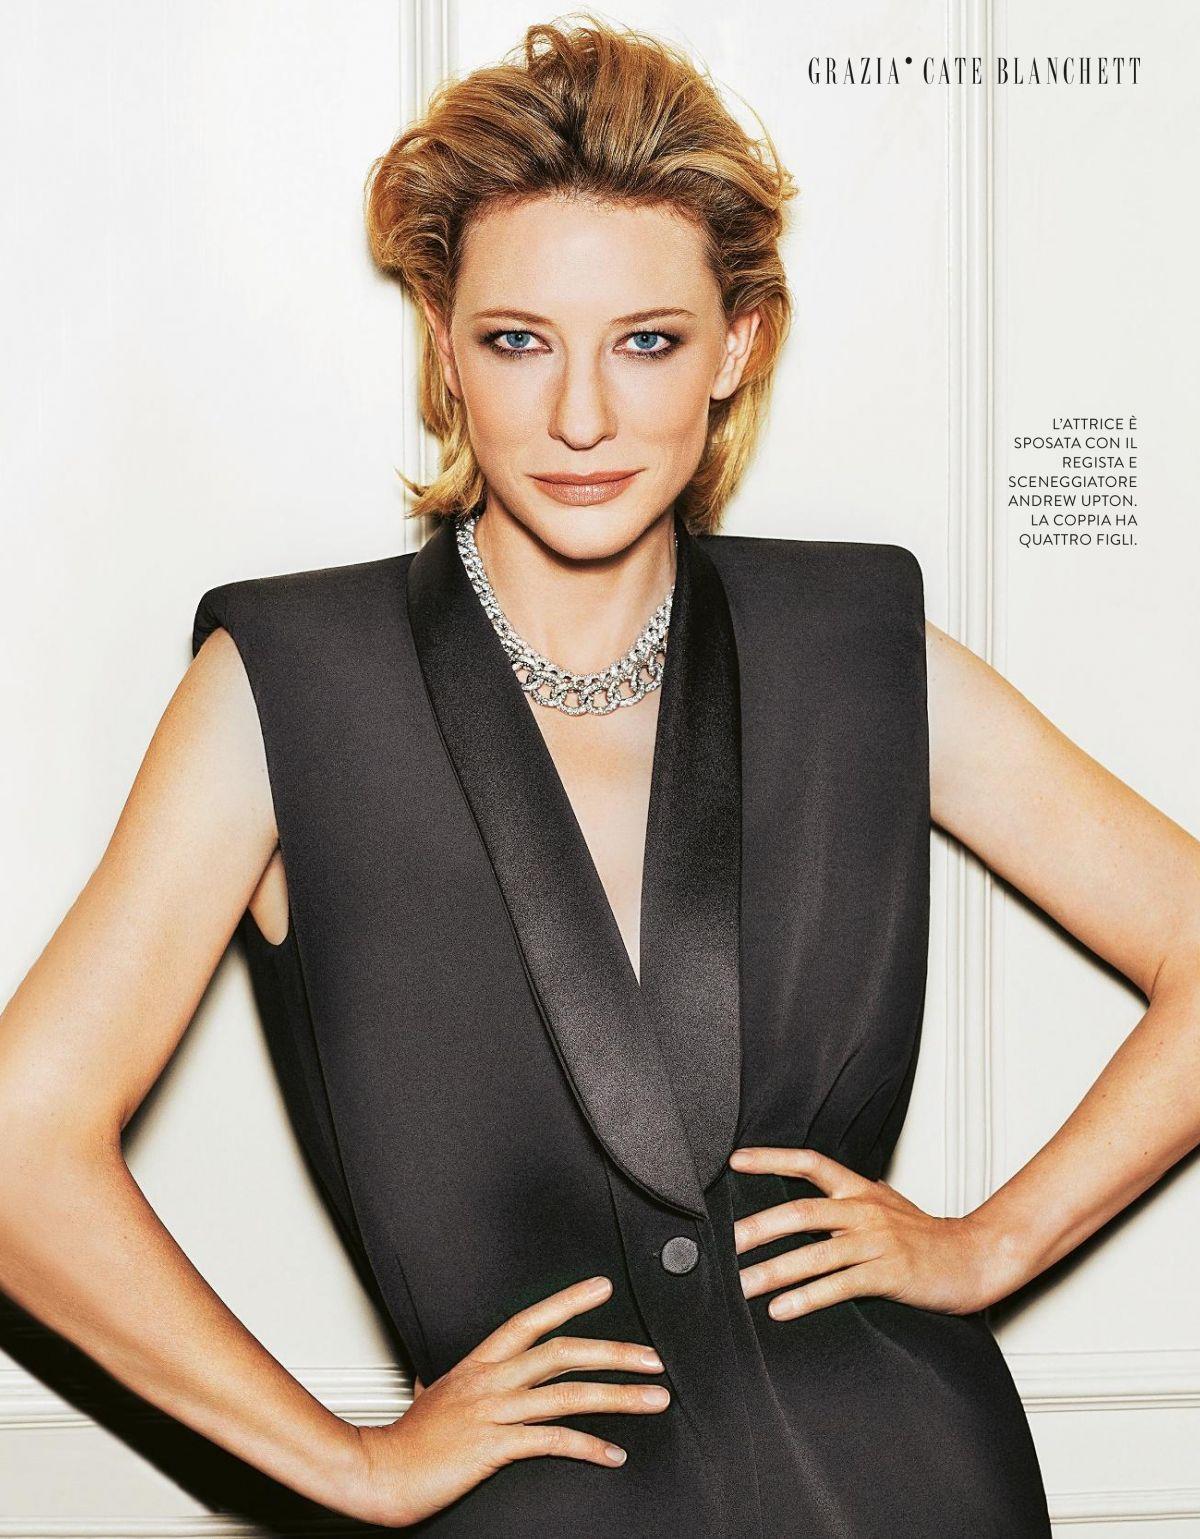 Cate Blanchett in Grazia Magazine, Italiy October 2017 Issue